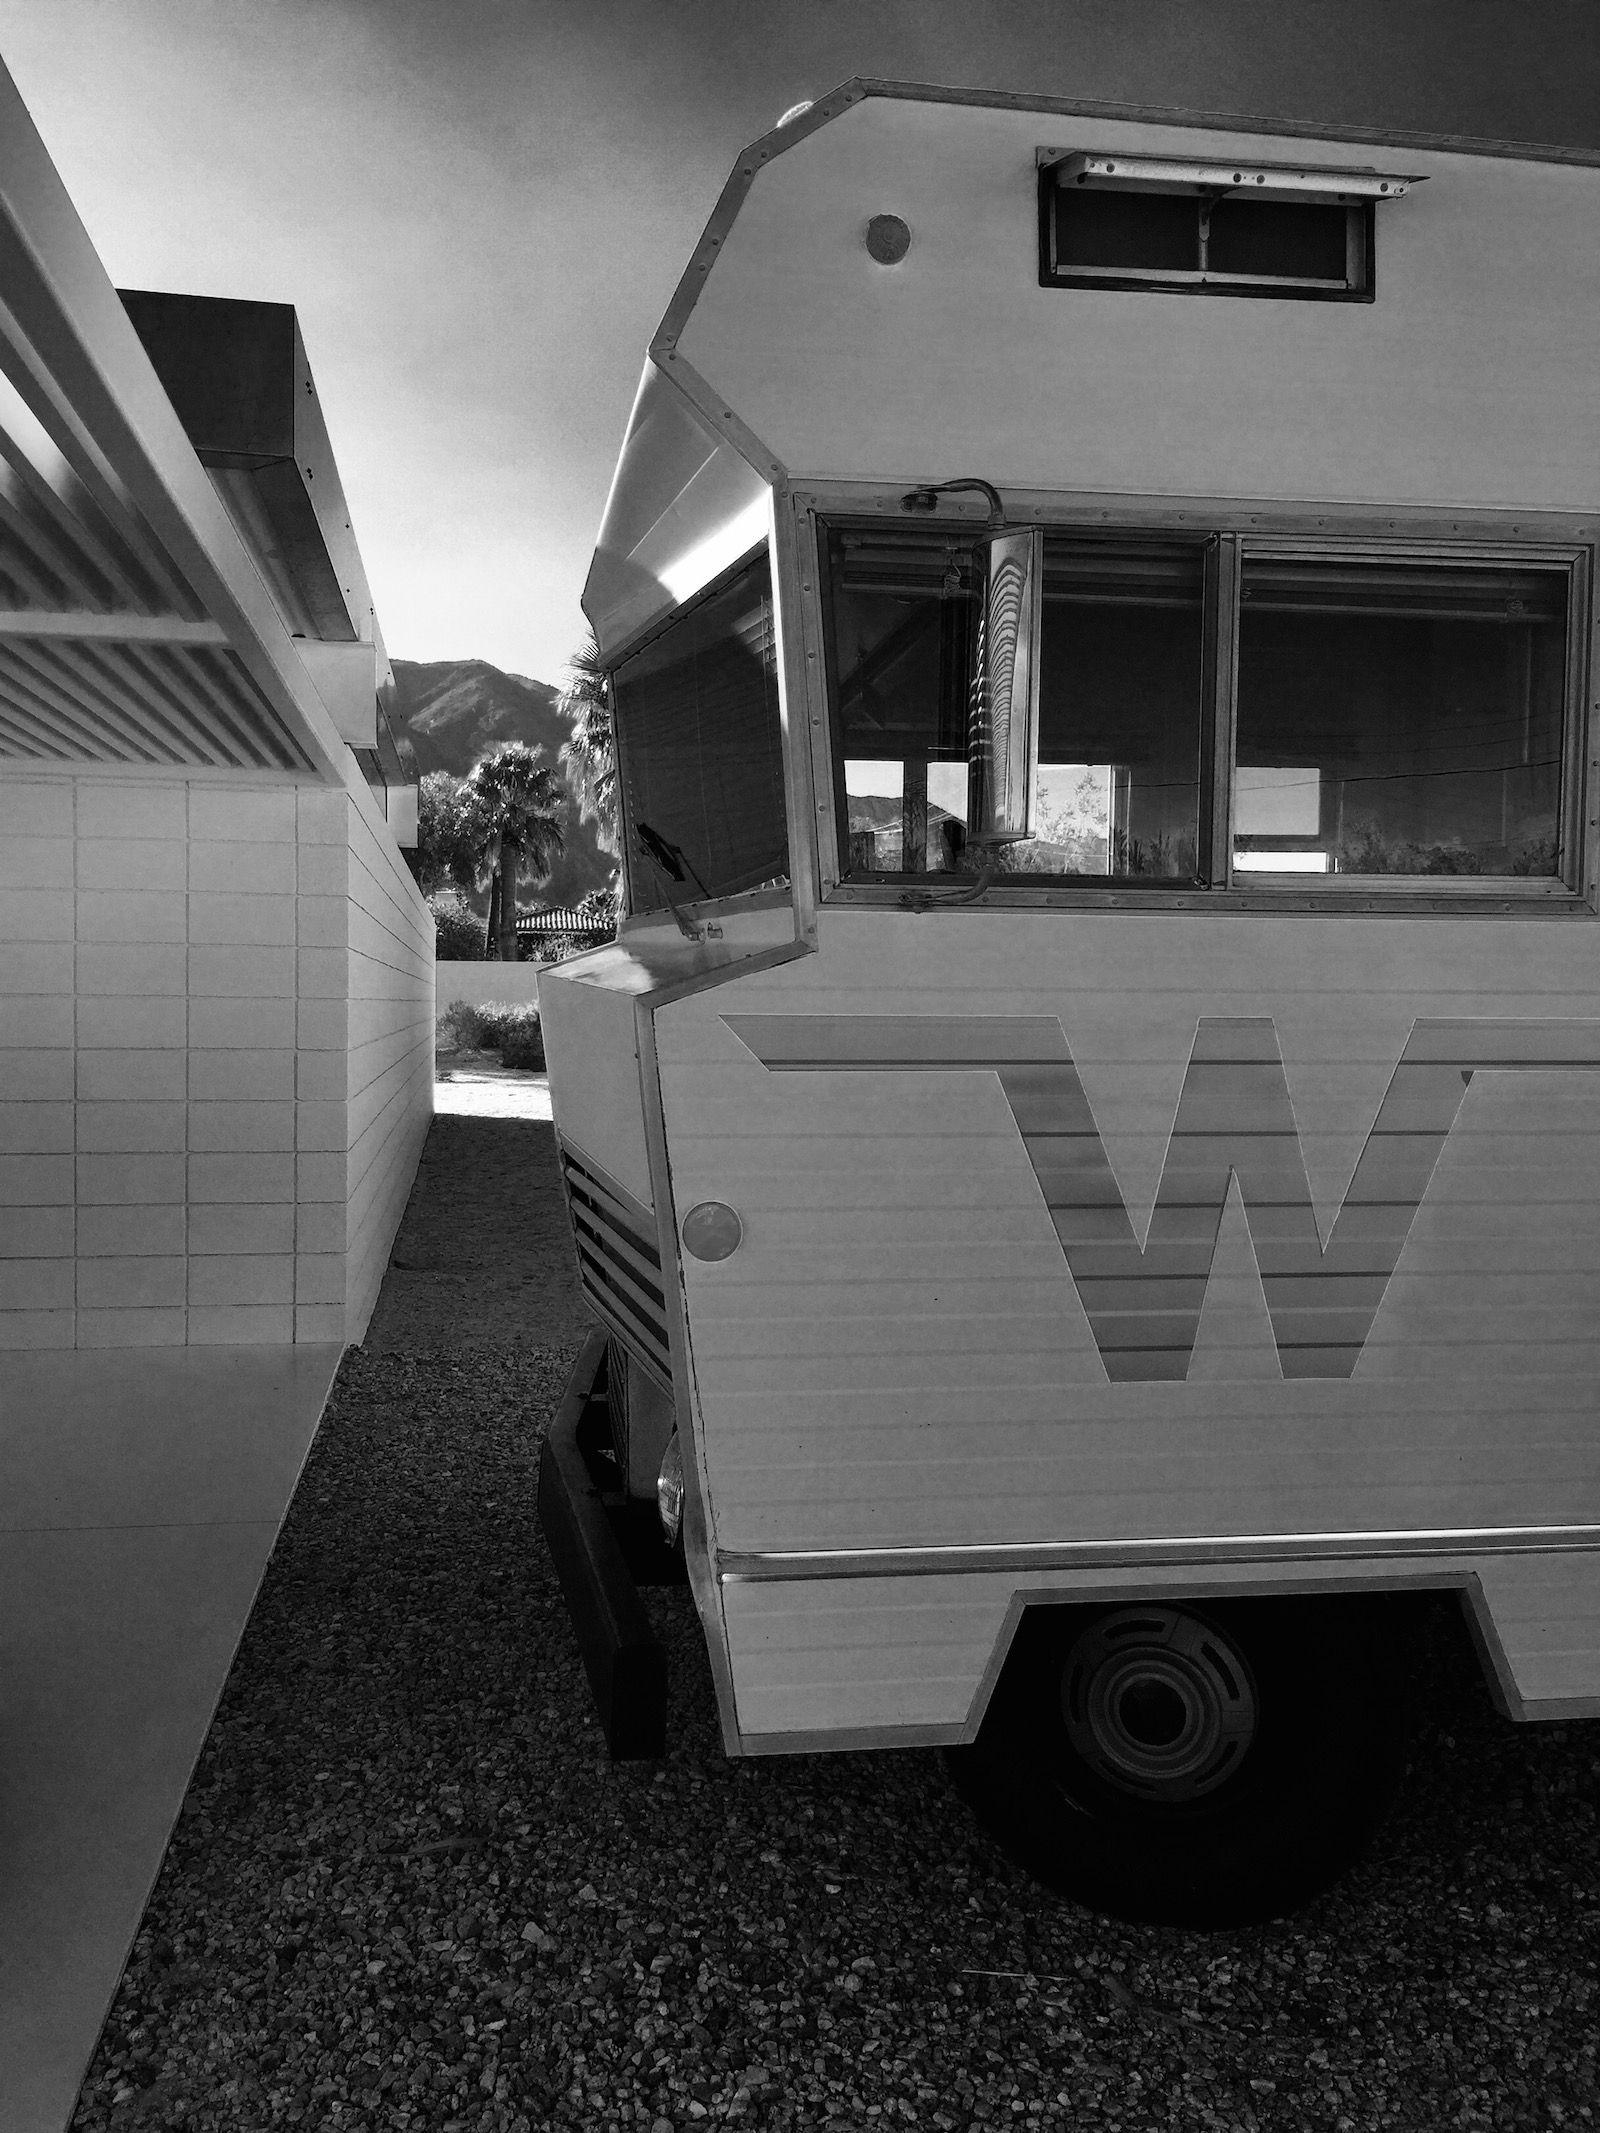 Rv Trailers For Sale Ontario >> 1968 F17 Winnebago | 1968 Winnebago Restoration | Vintage rv, Rv trailers, Classic trailers